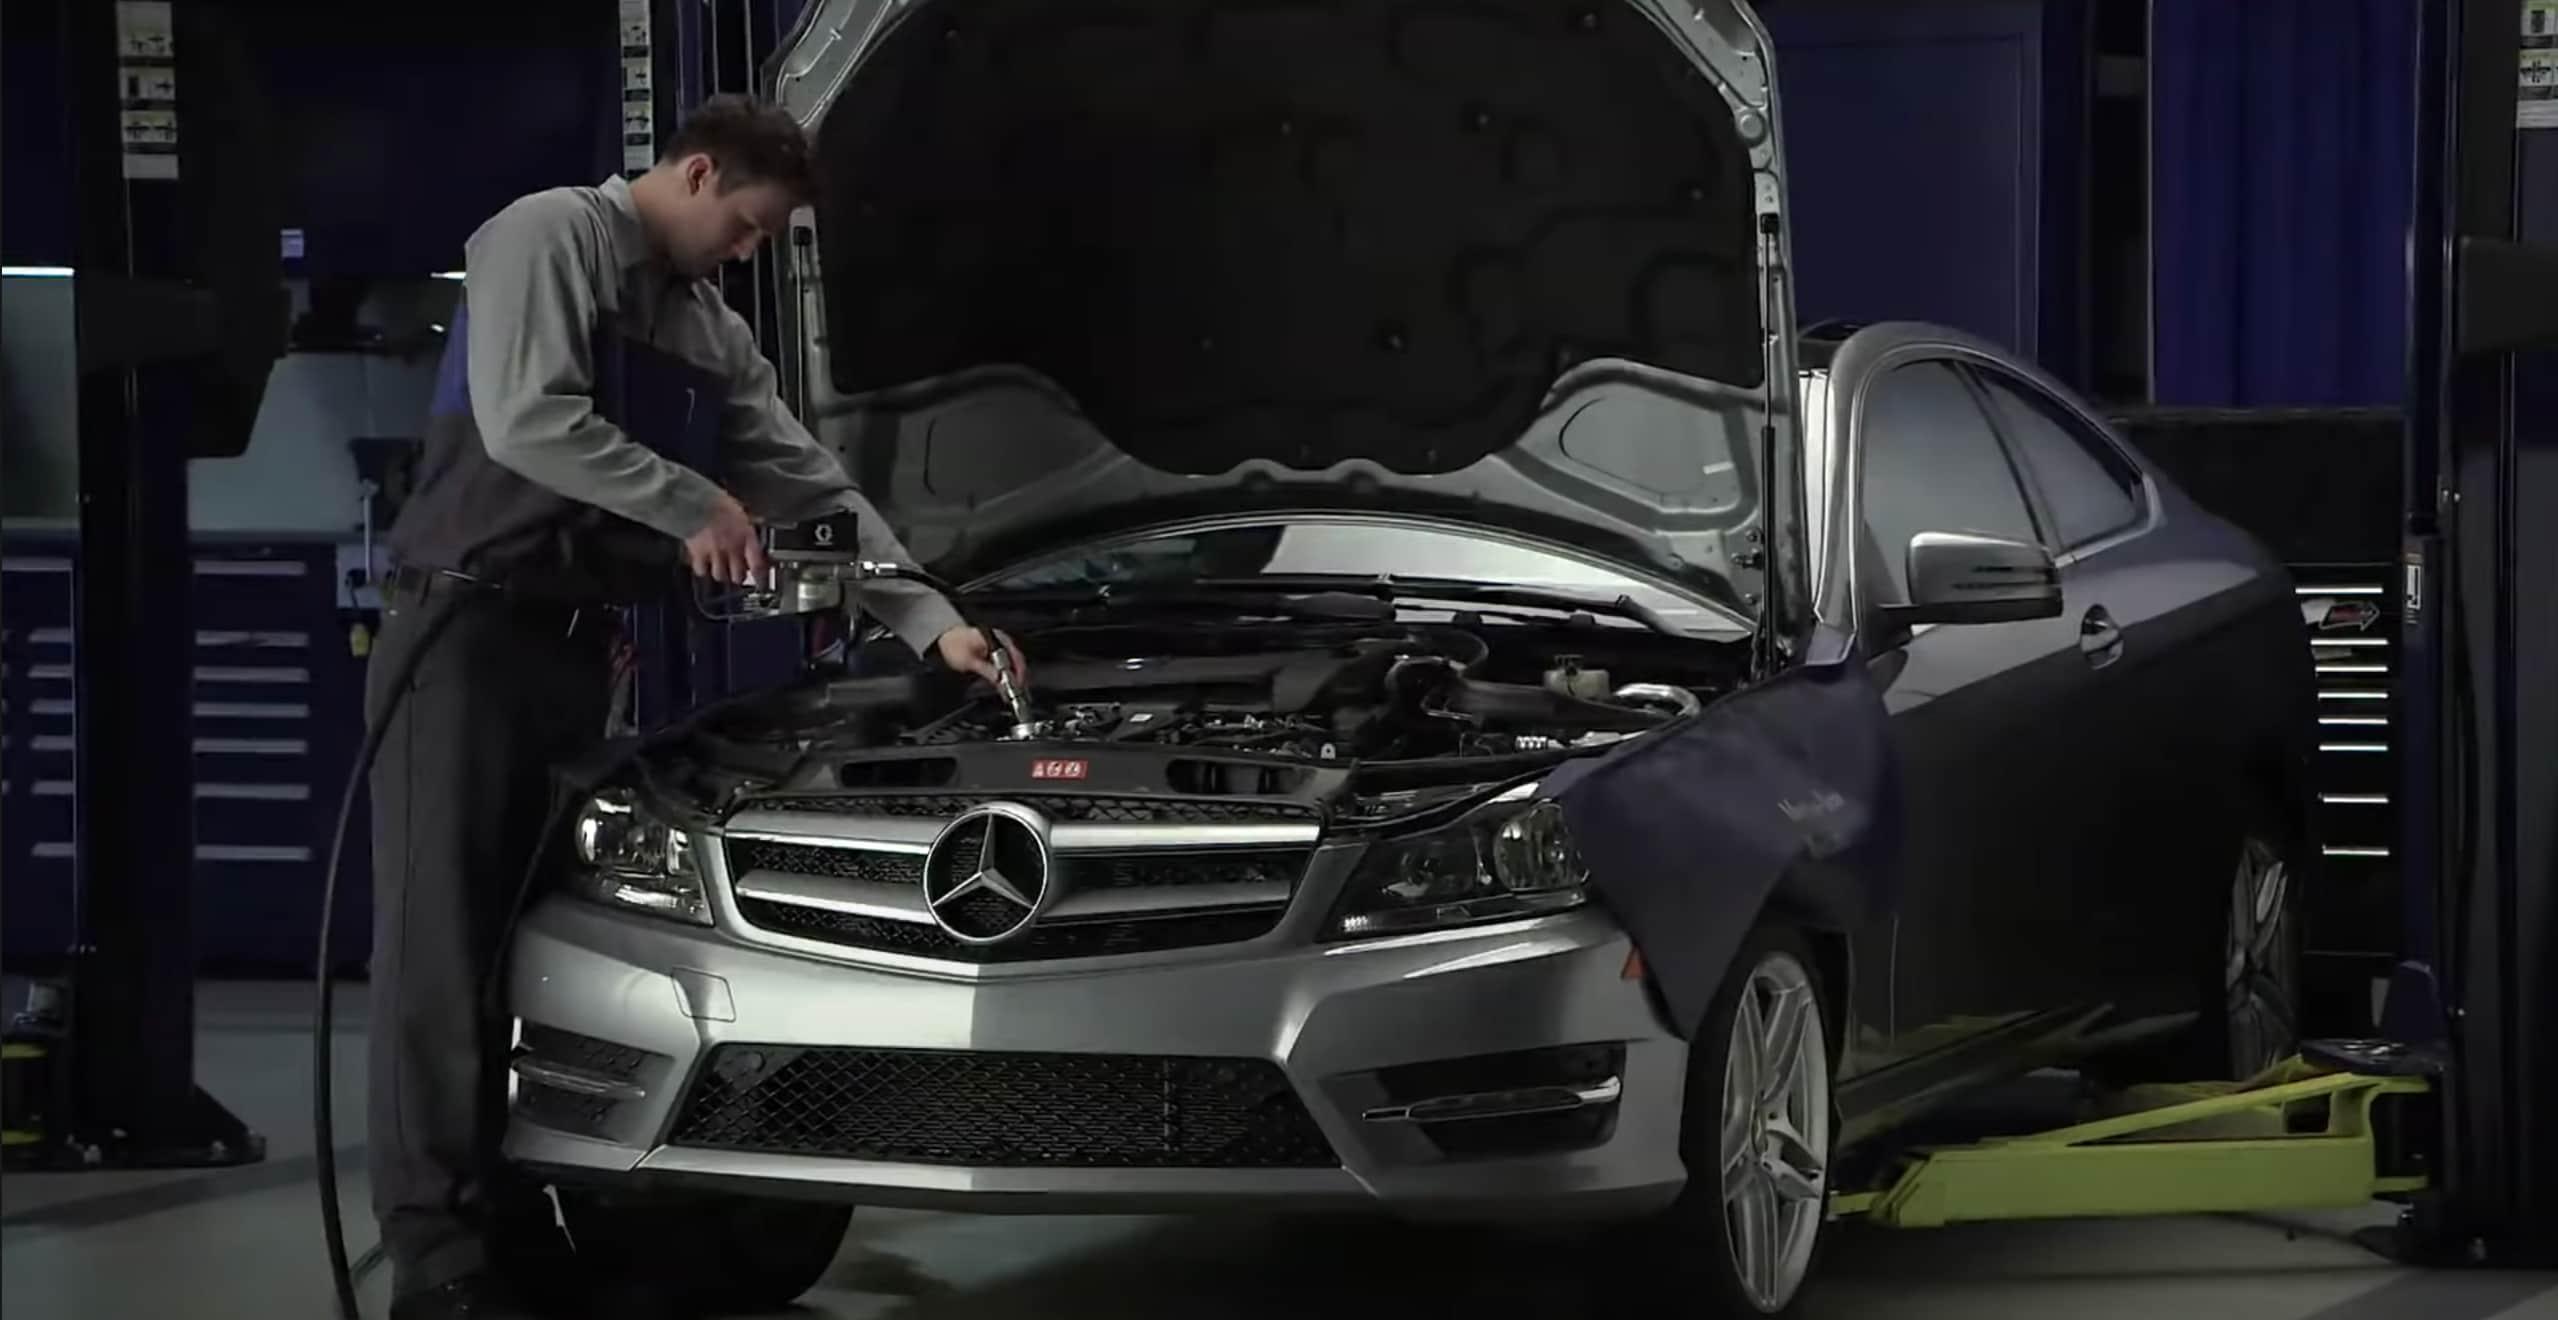 Mercedes-Benz C-Class at service bay